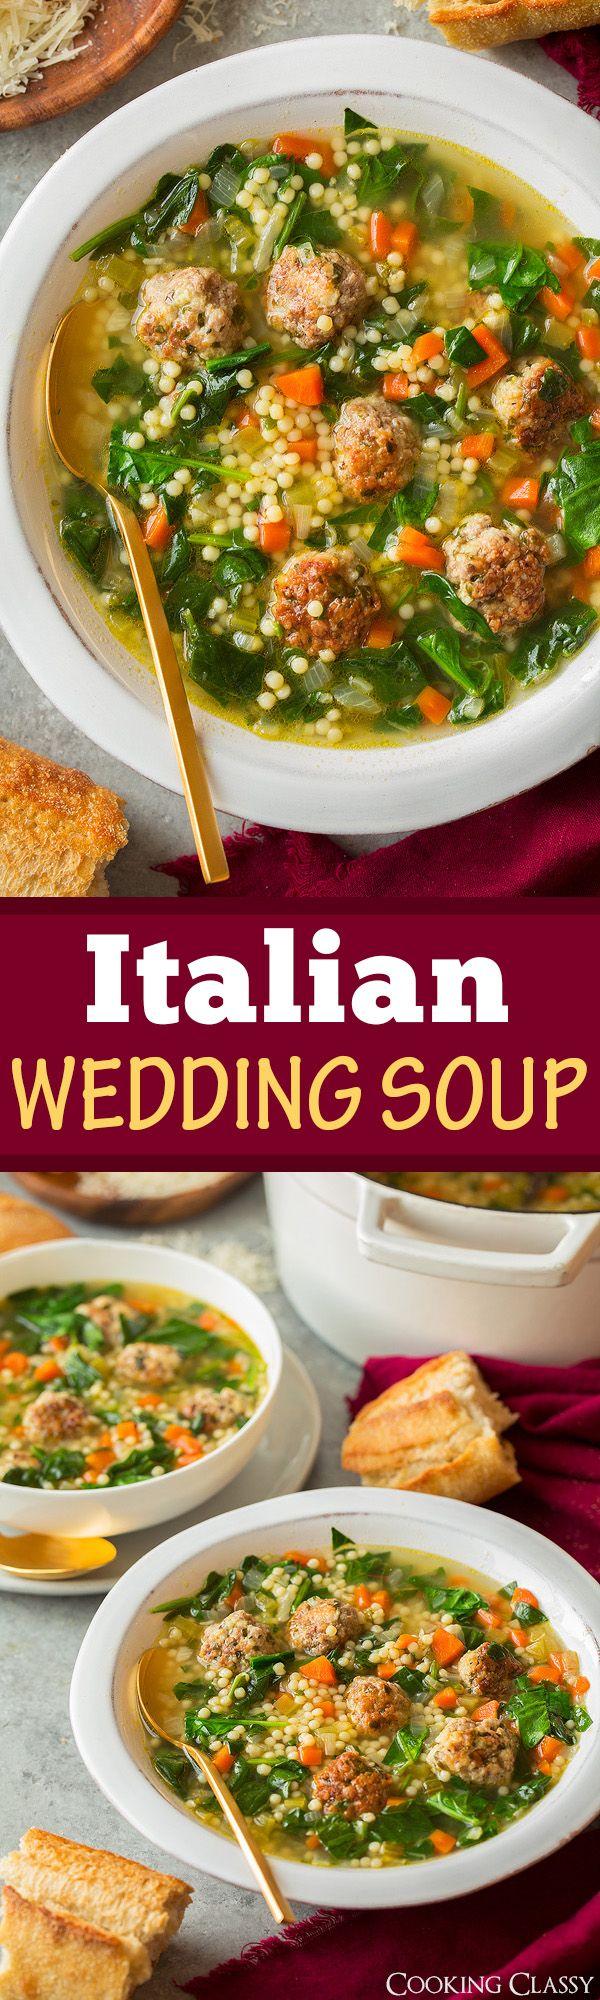 Italian Wedding Soup - Cooking Classy